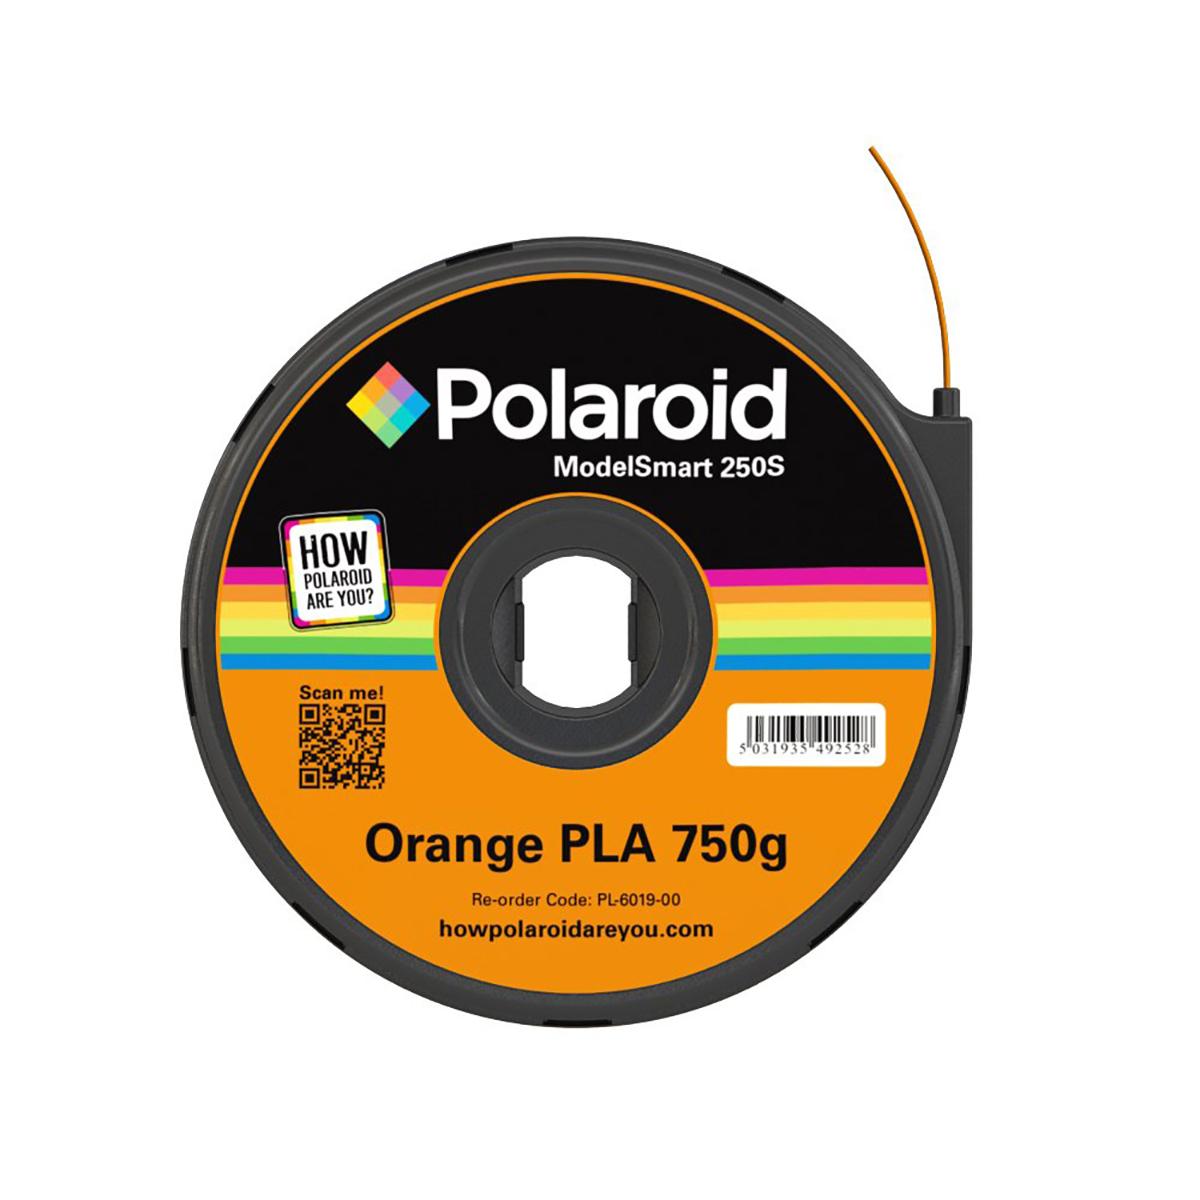 Polaroid ModelSmart 250S Orange Filament Cartridge - 750g